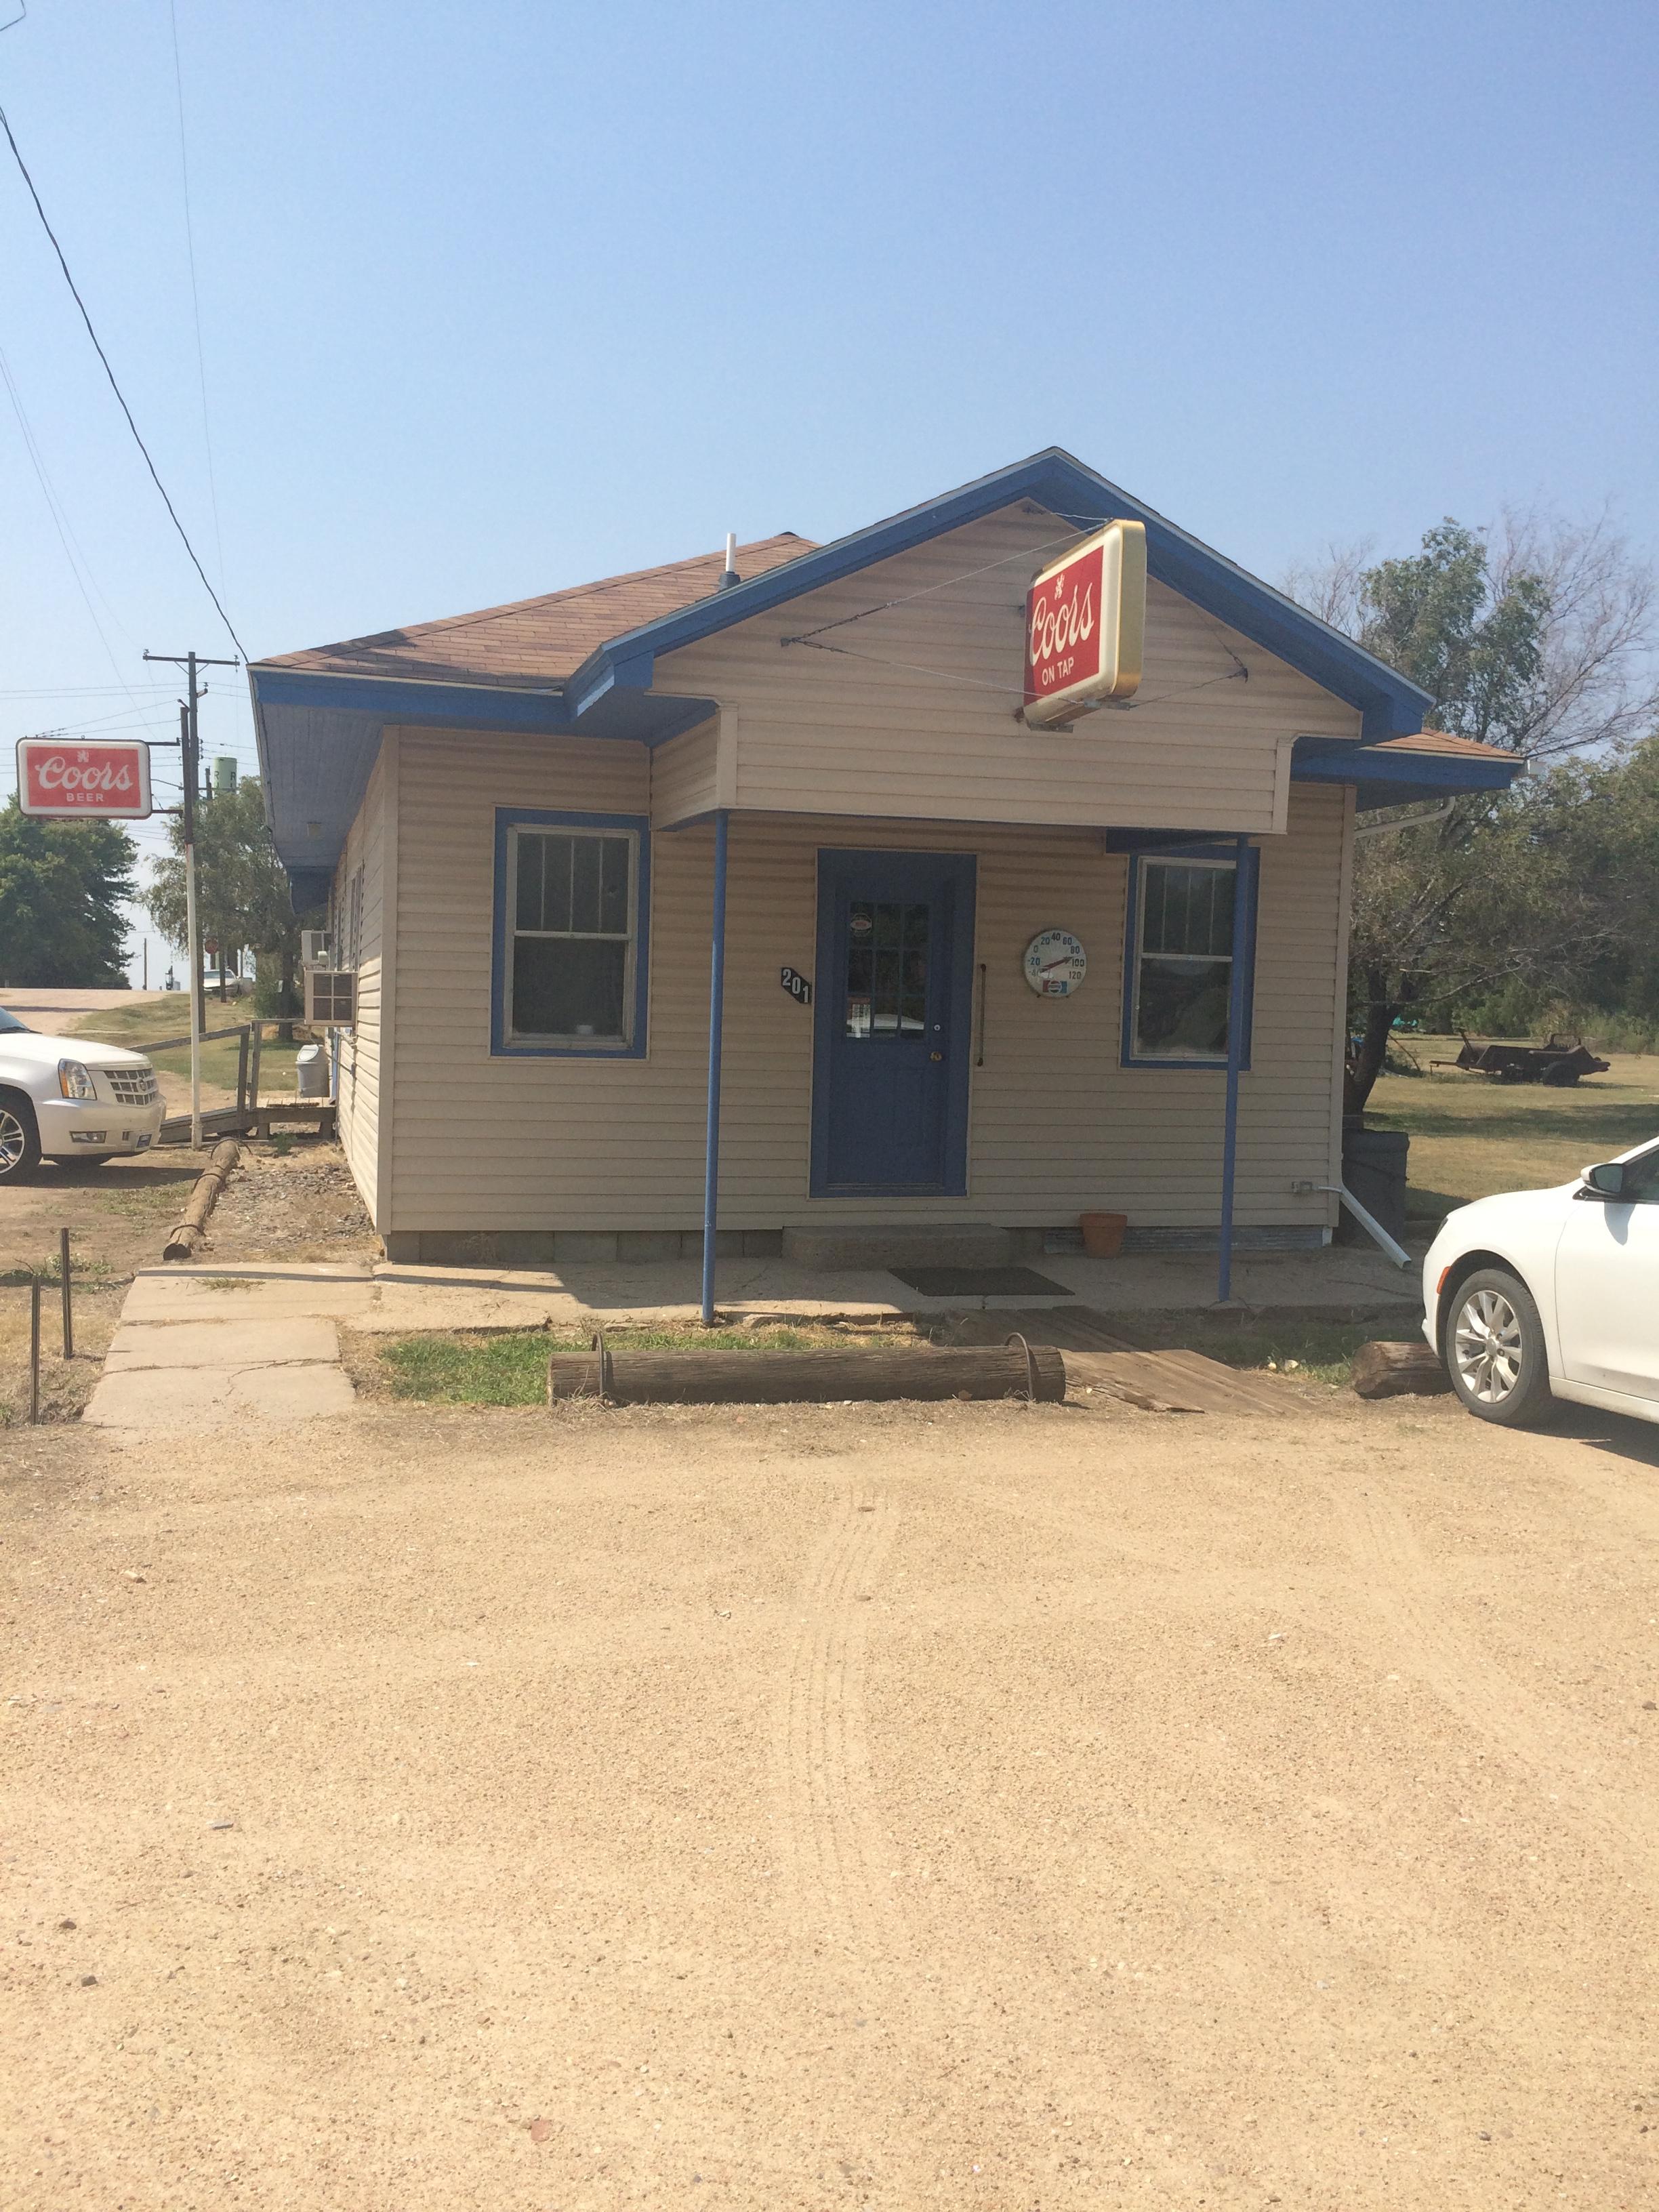 201 Main Street, Susank, Kansas 67544